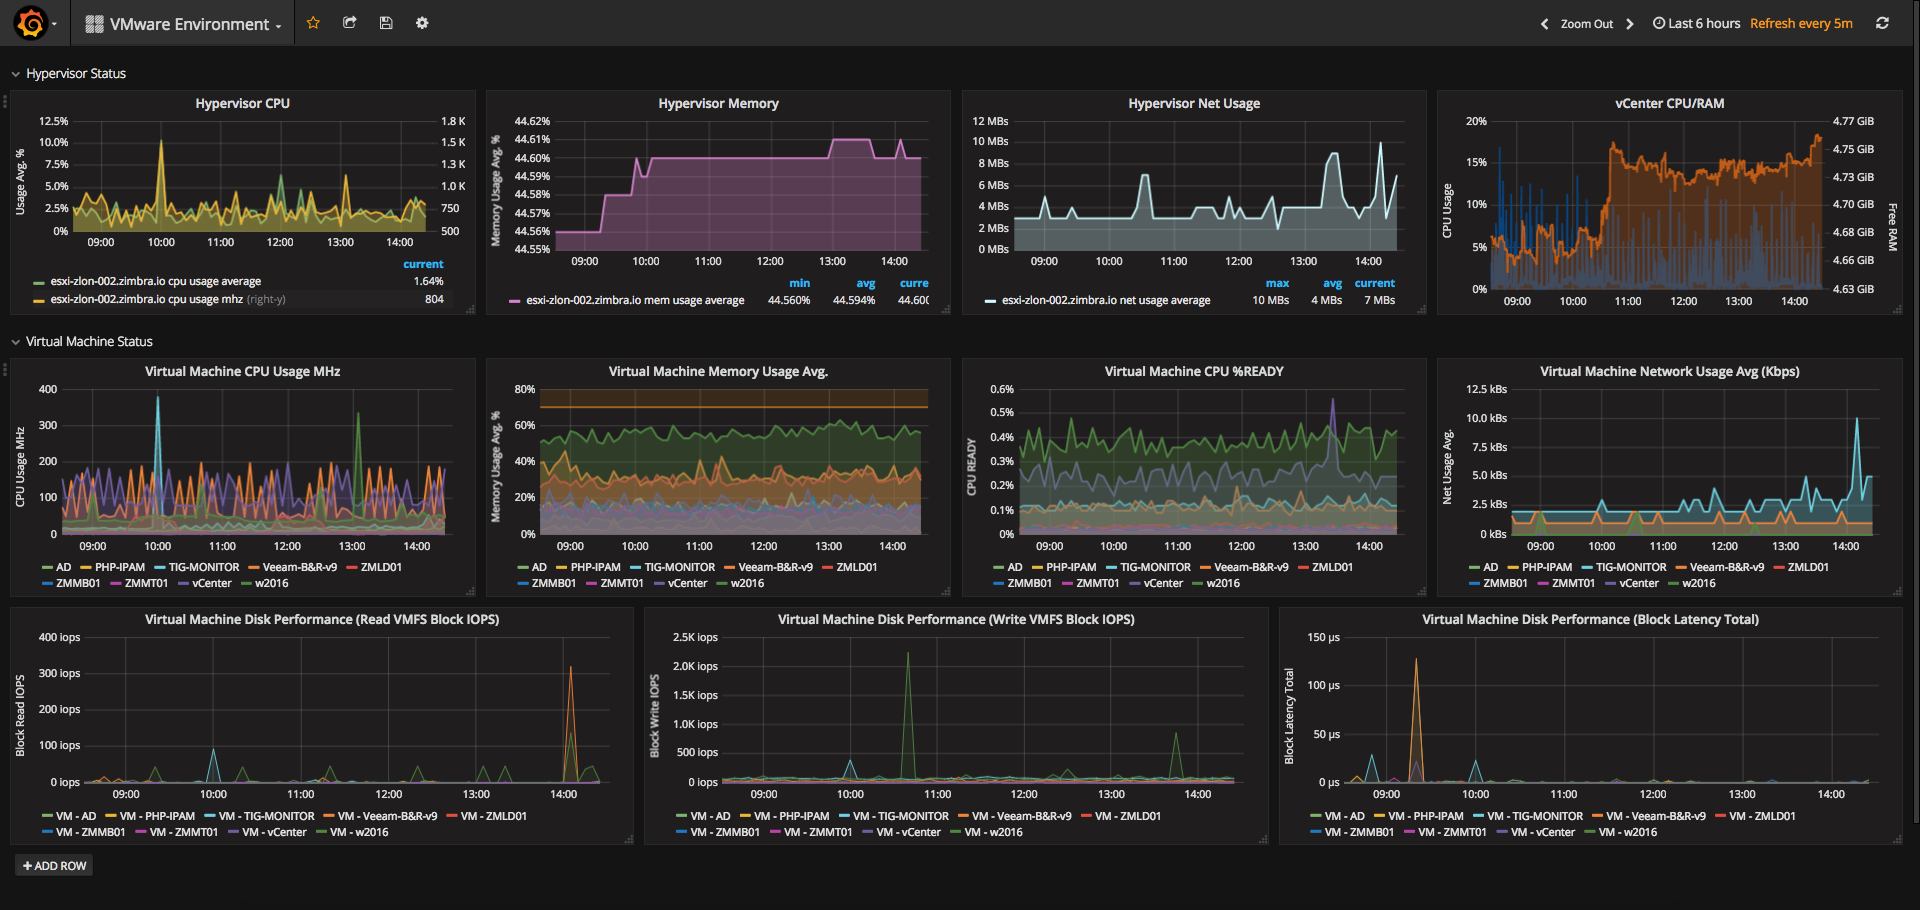 Vmware Environment Performance Dashboard For Grafana